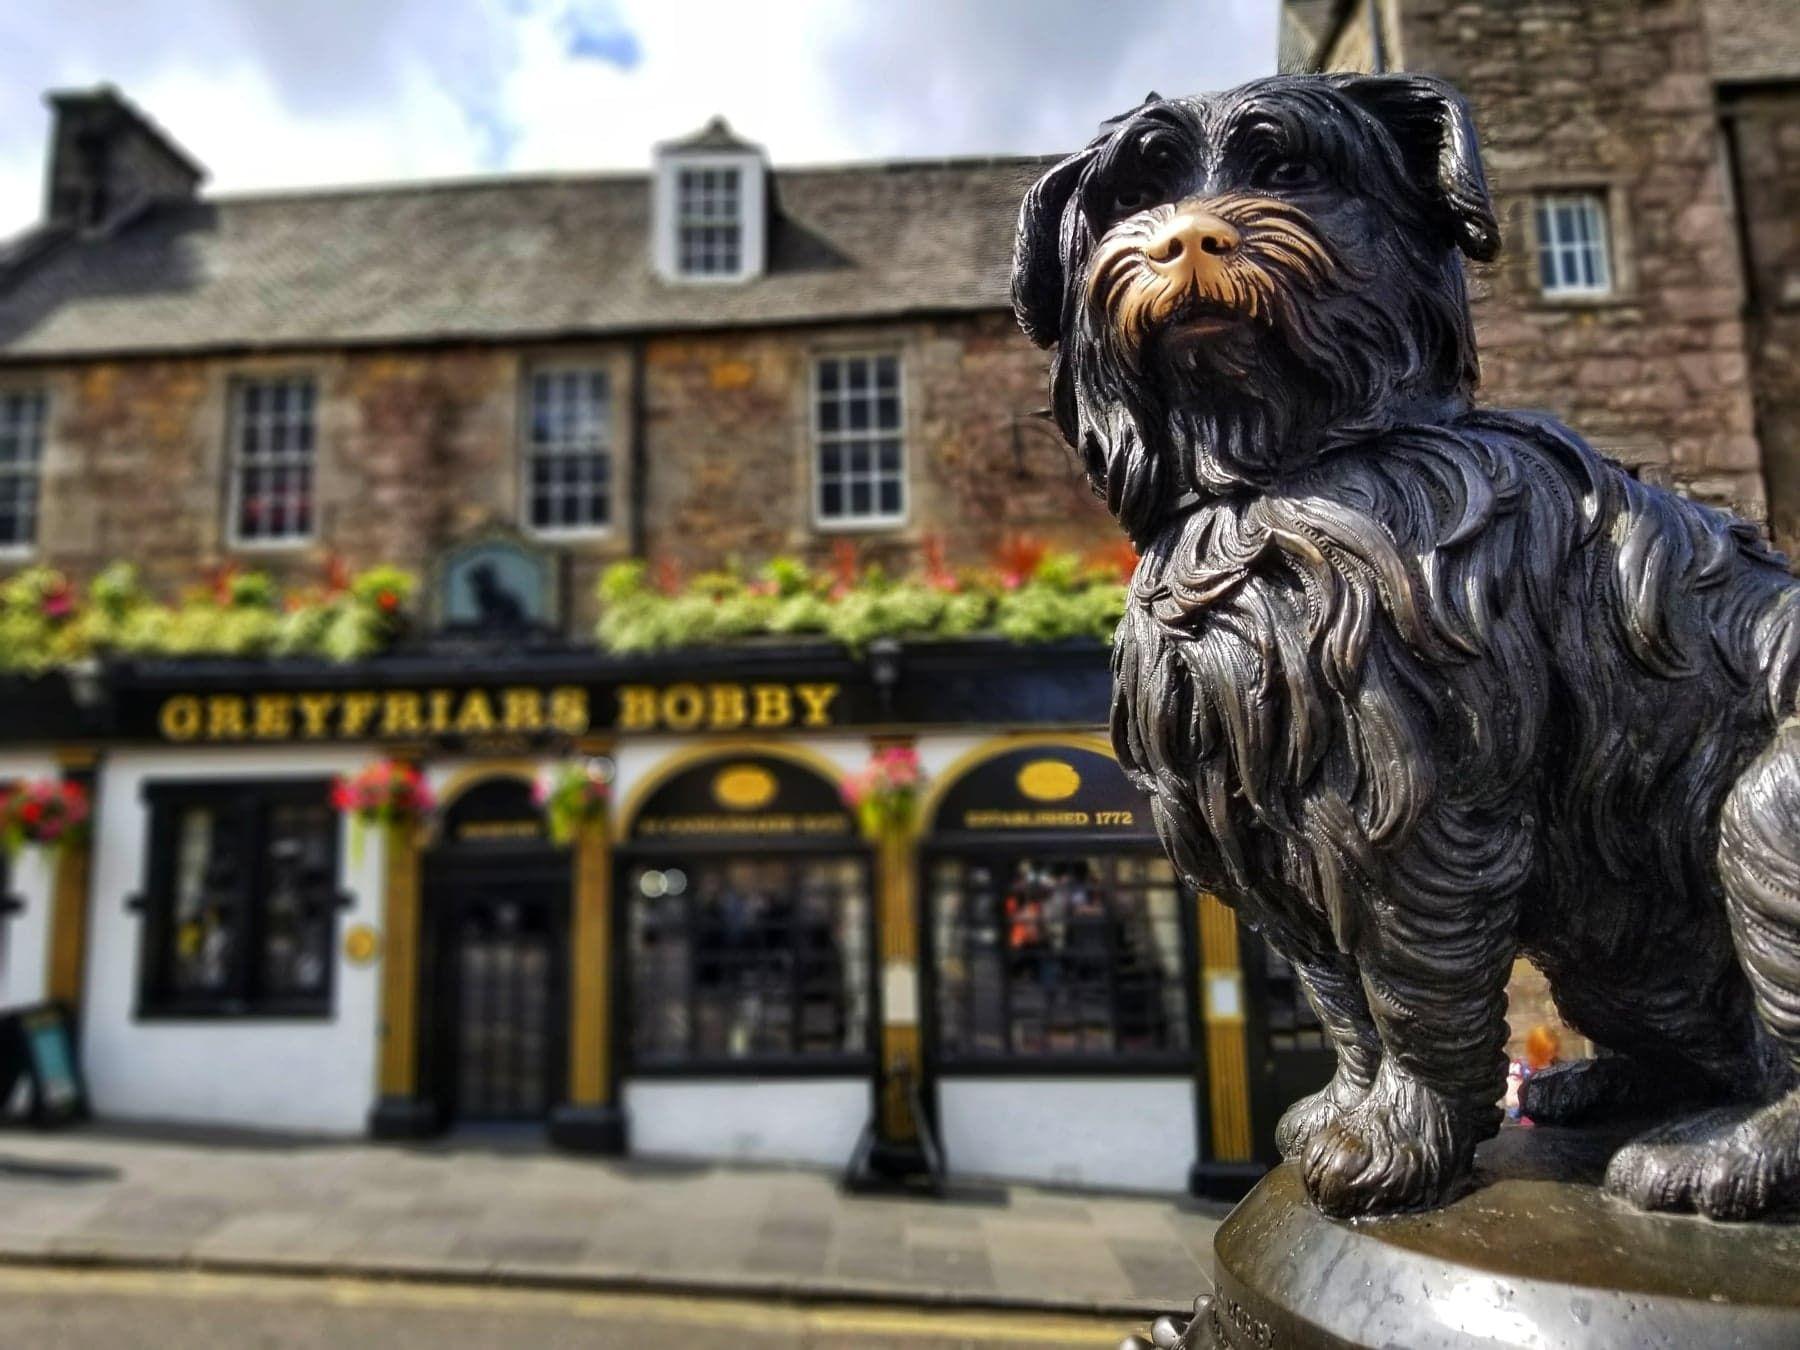 Places To Visit In Edinburgh Greyfriars Bobby Statue Edinburgh Travel Edinburgh Greyfriars Bobby